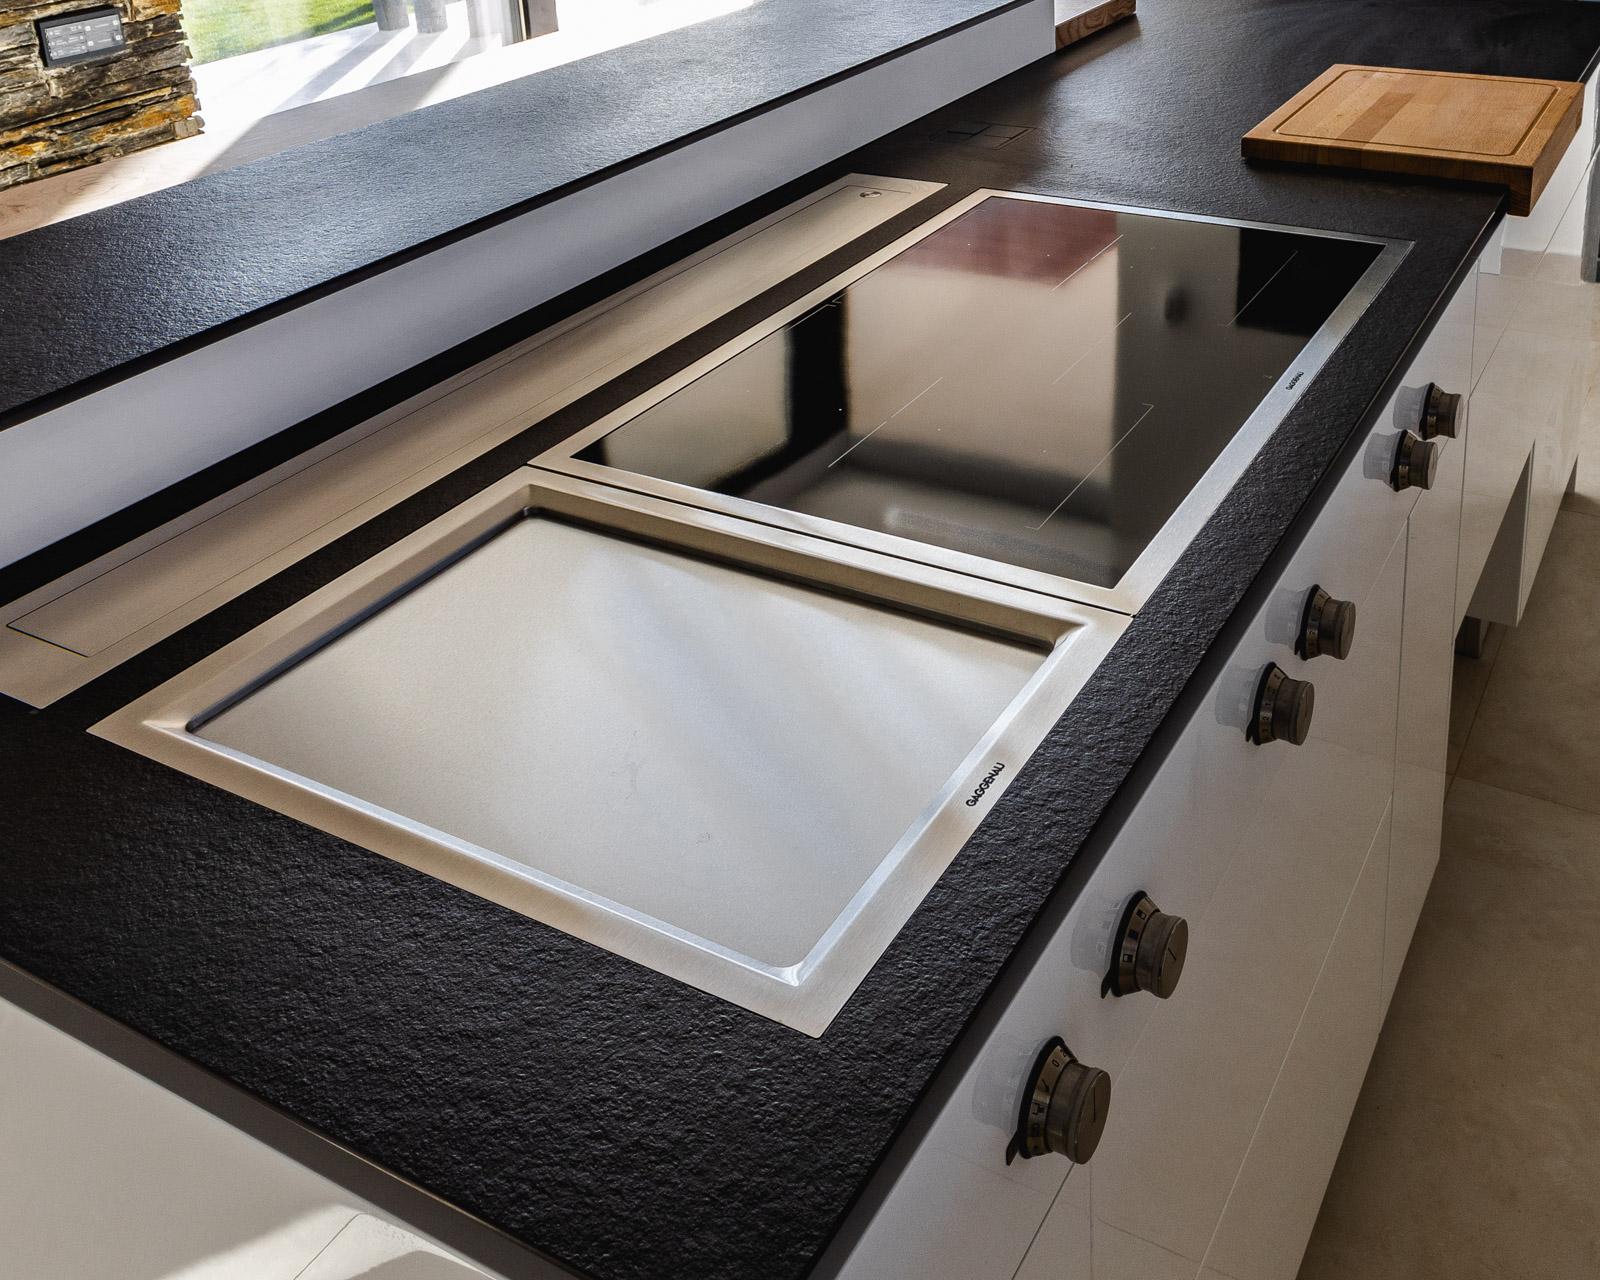 Island kitchen with induction hob, teppanyaki and extractor Gaggenau